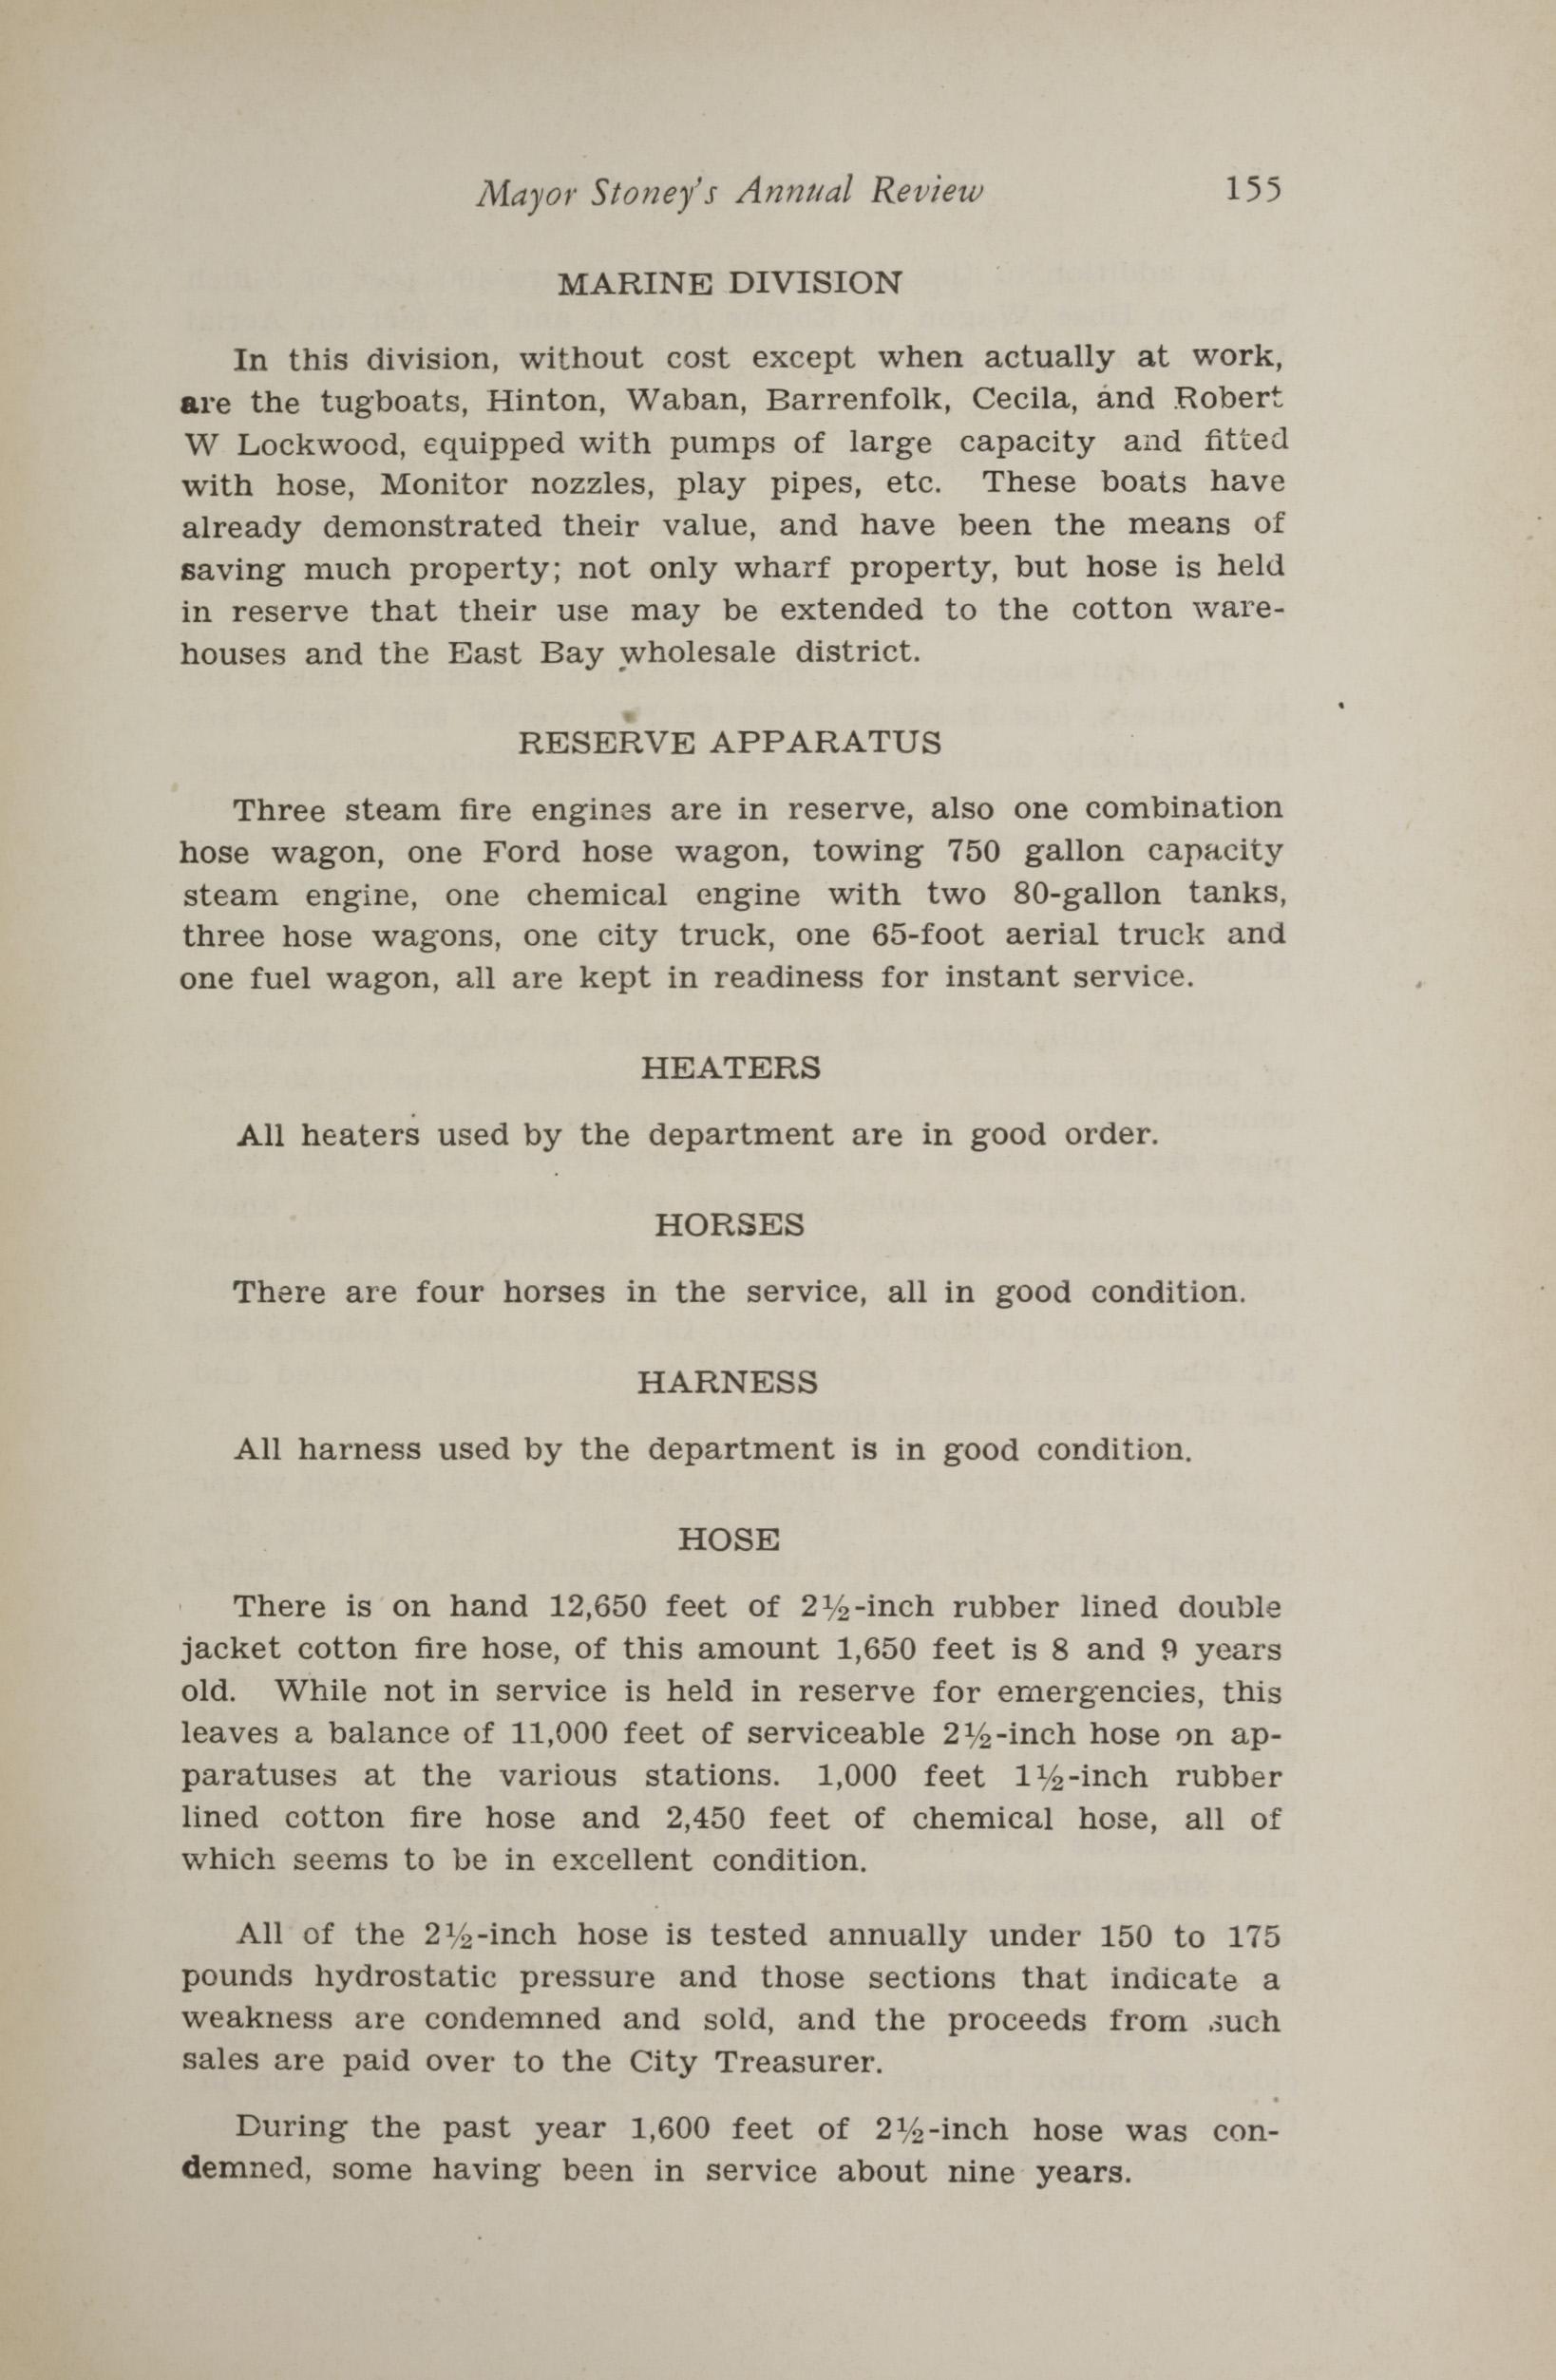 Charleston Yearbook, 1930, page 155